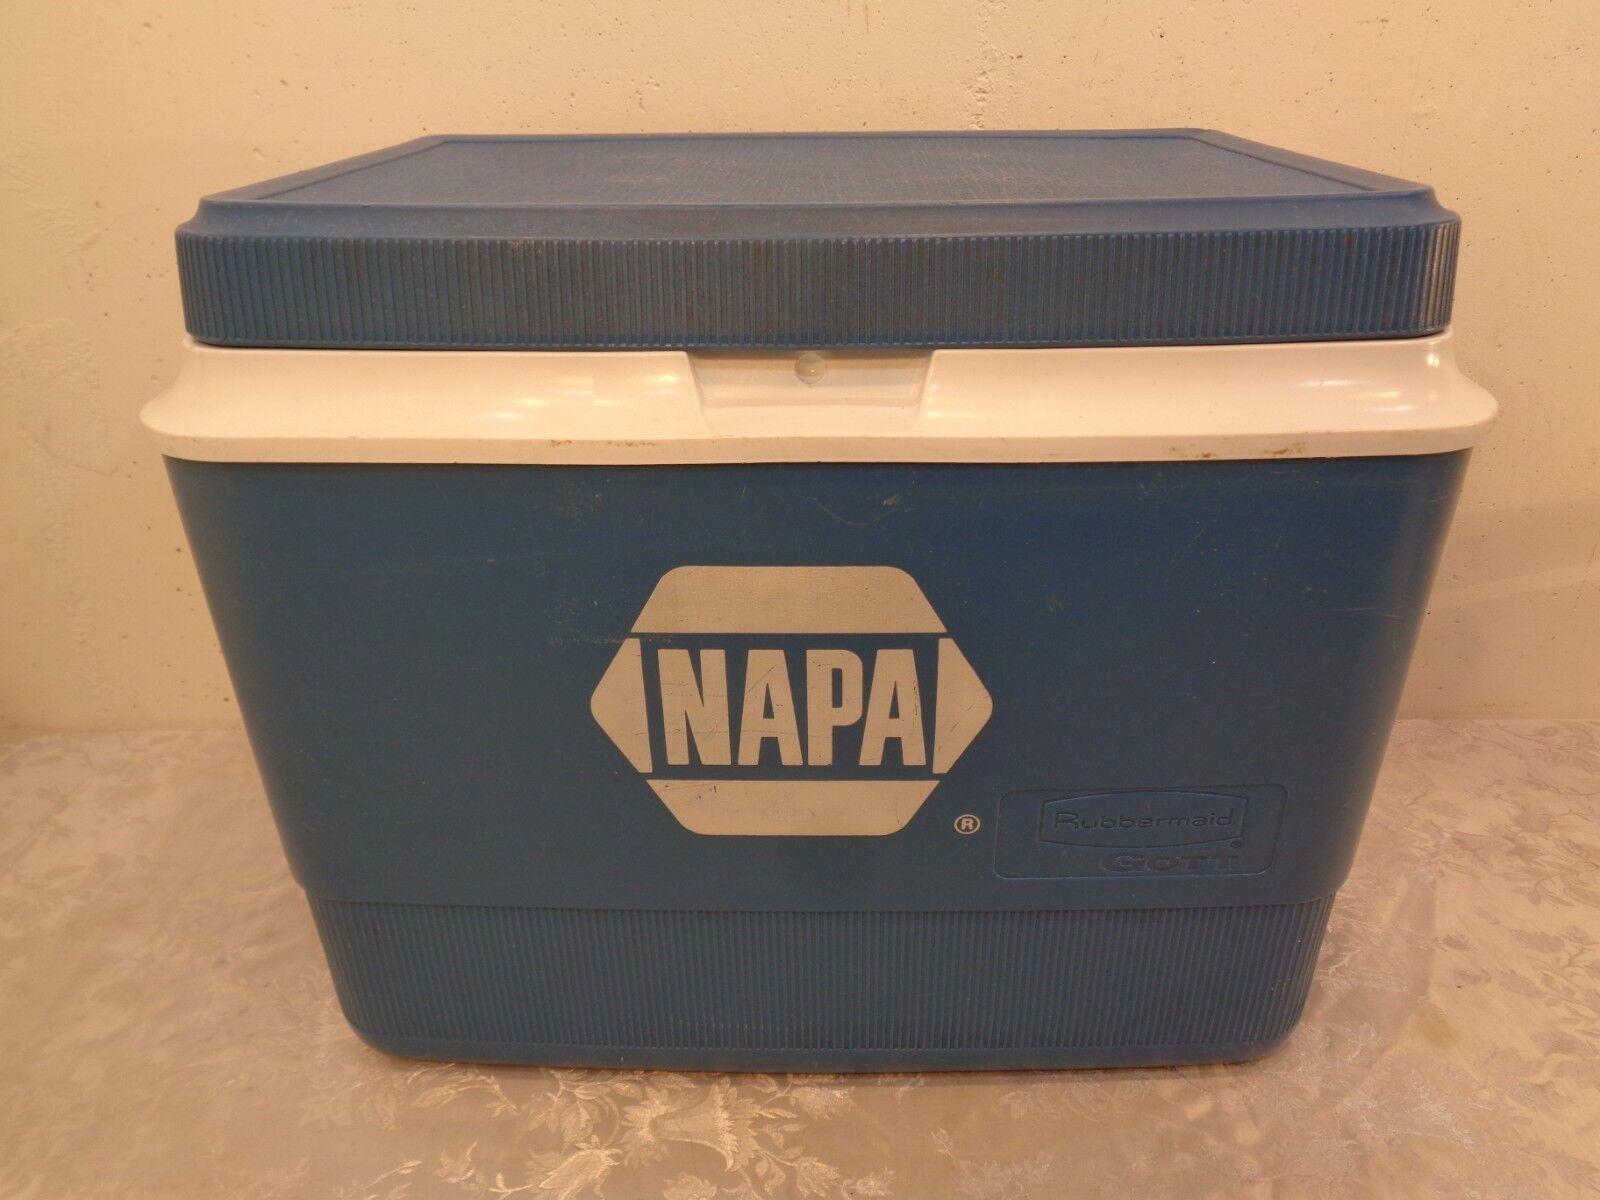 Gott Ice Chest Cooler No.1940 NAPA Auto Parts Adgreenising Large 21  X 14  X 16